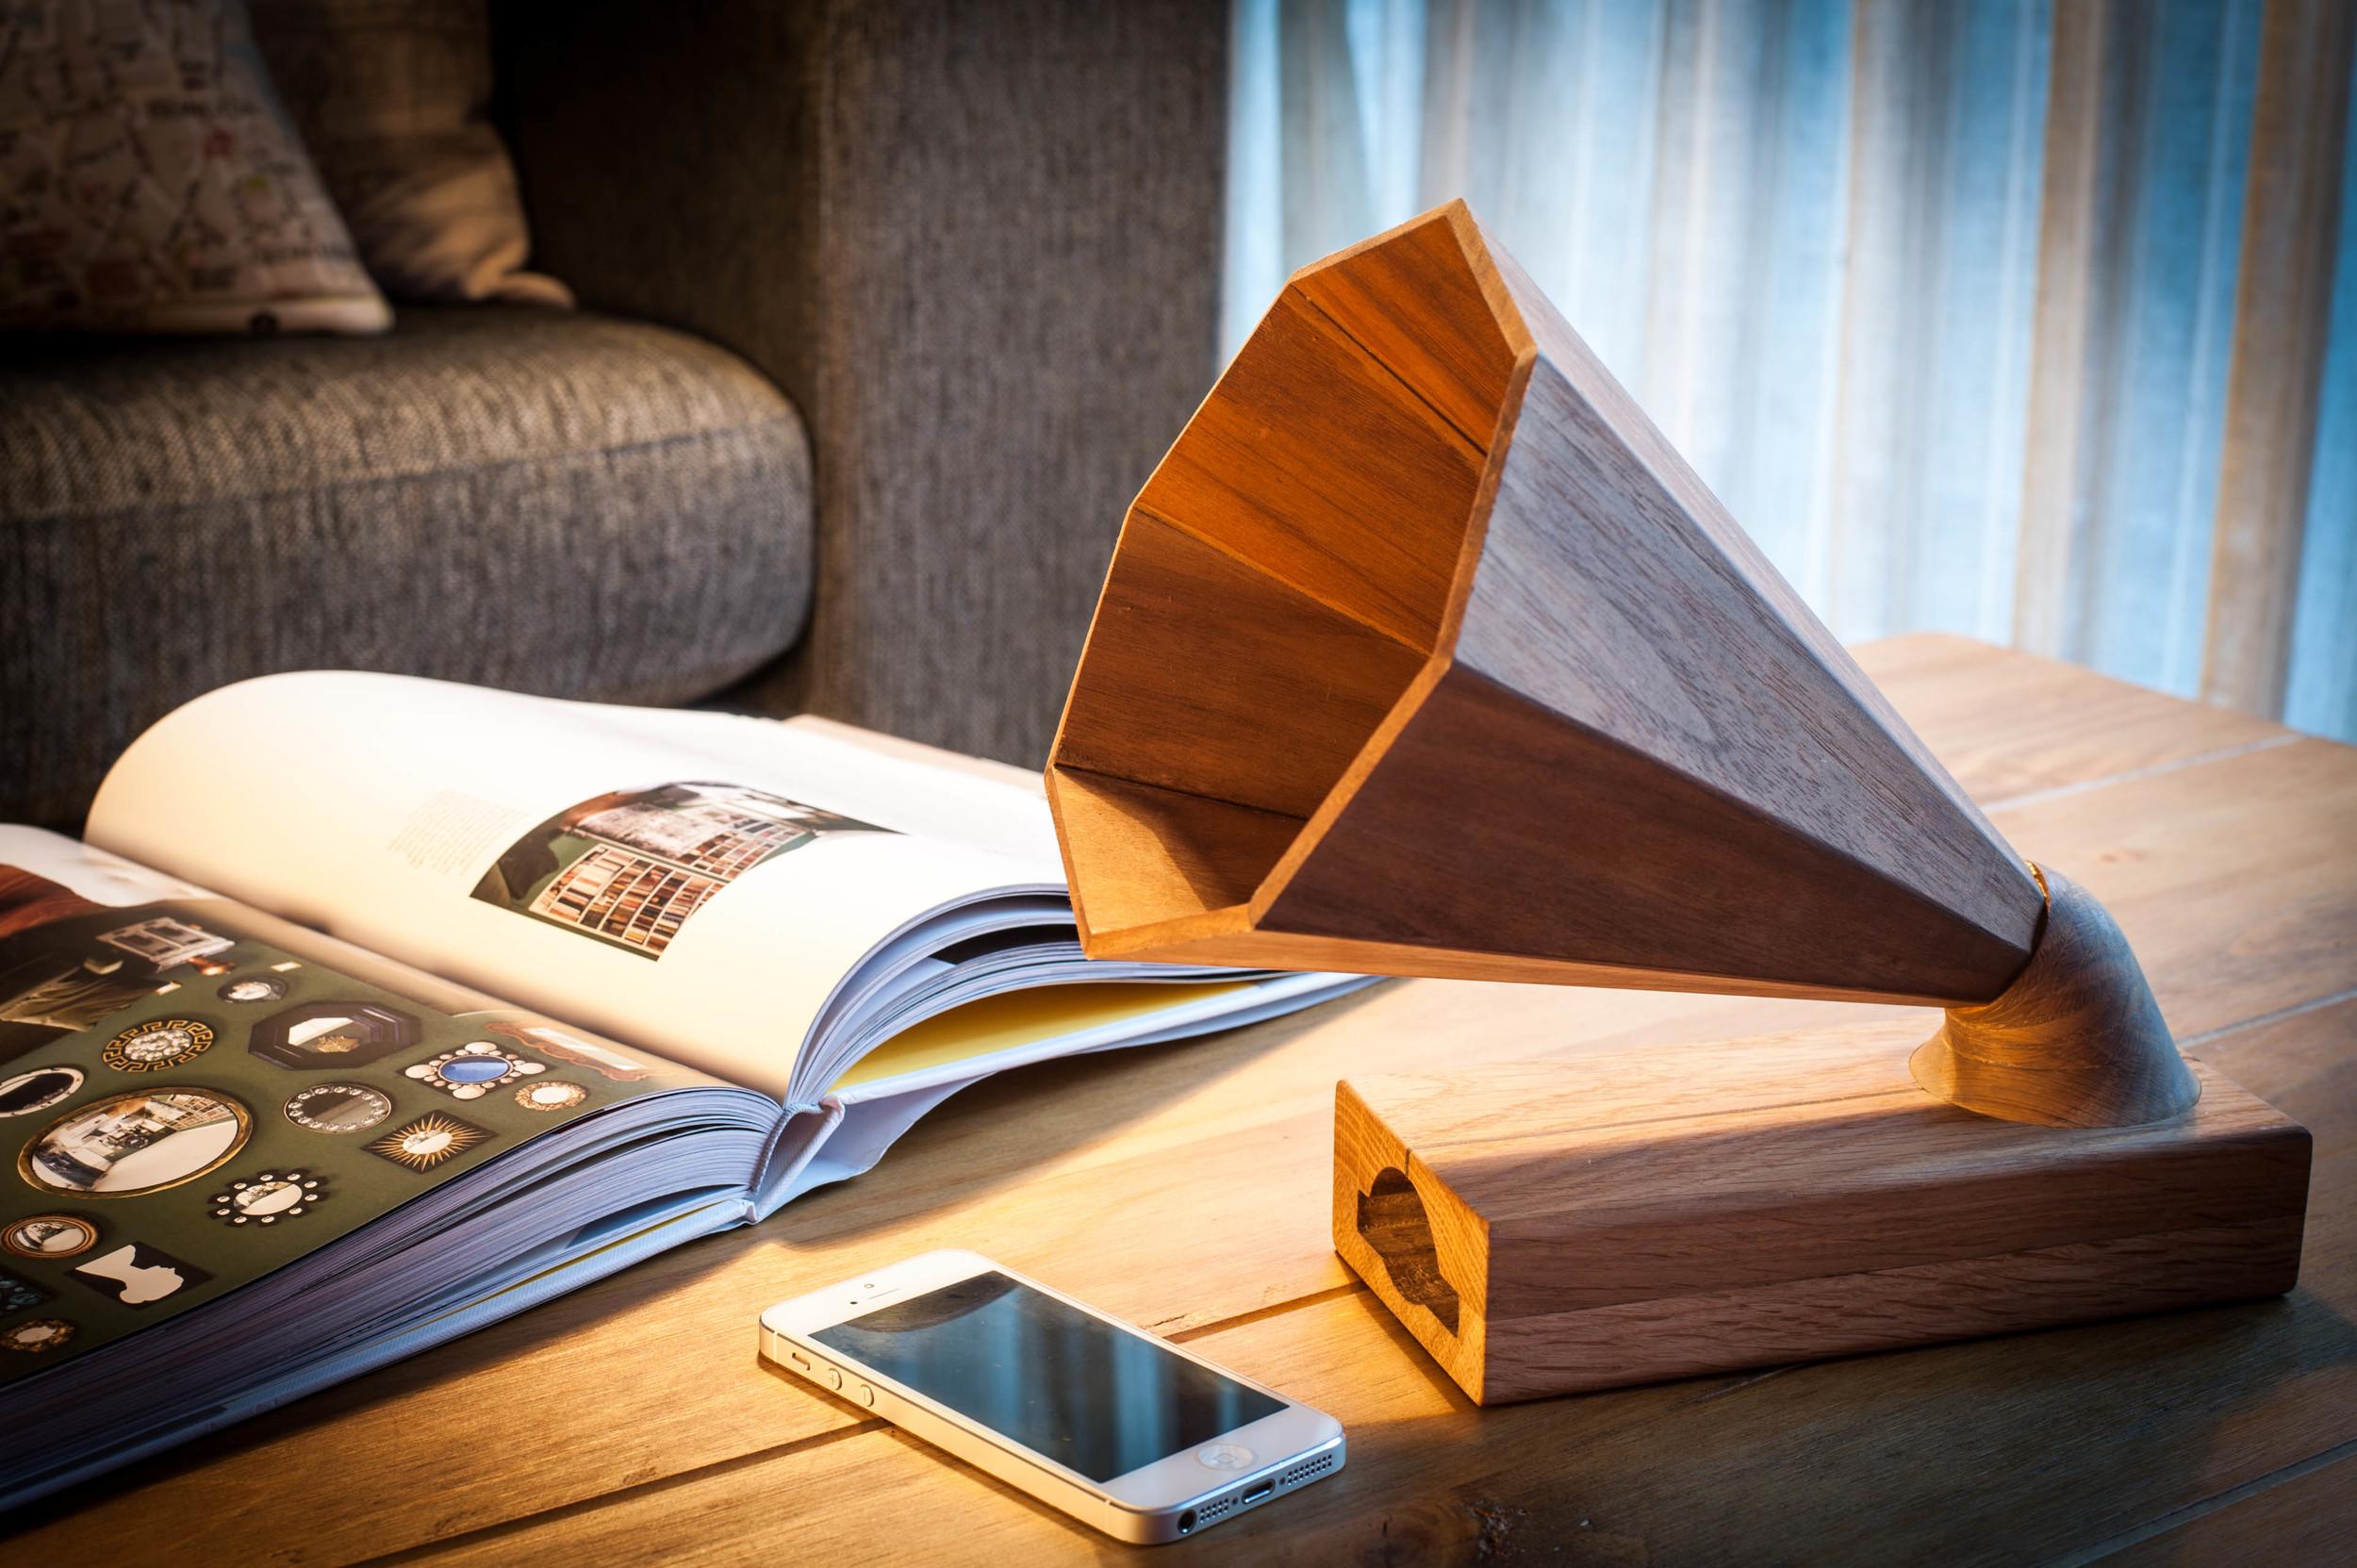 Preorder Wooden iPhone Amplifier Here